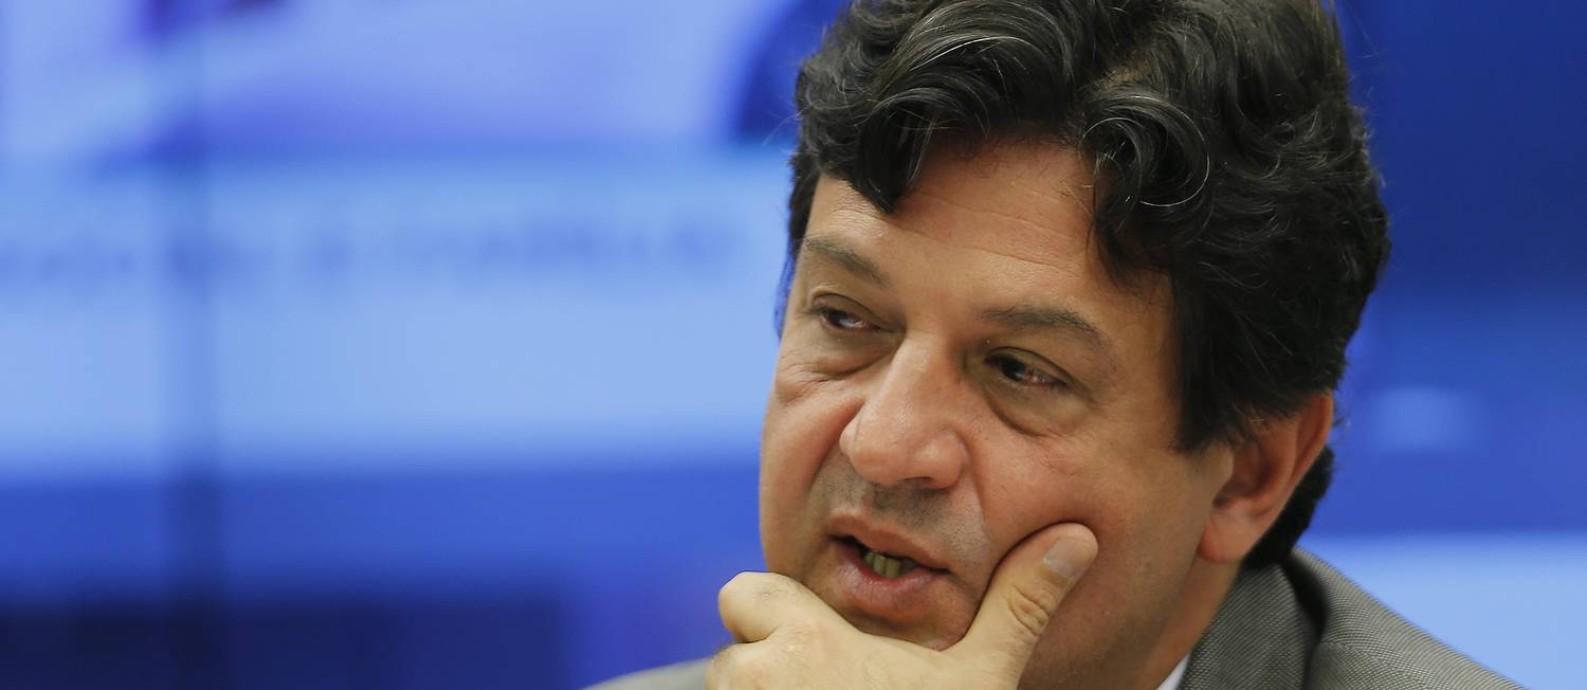 Ministro da Saúde, Luiz Henrique Mandetta. Foto: Jorge William / Agência O Globo